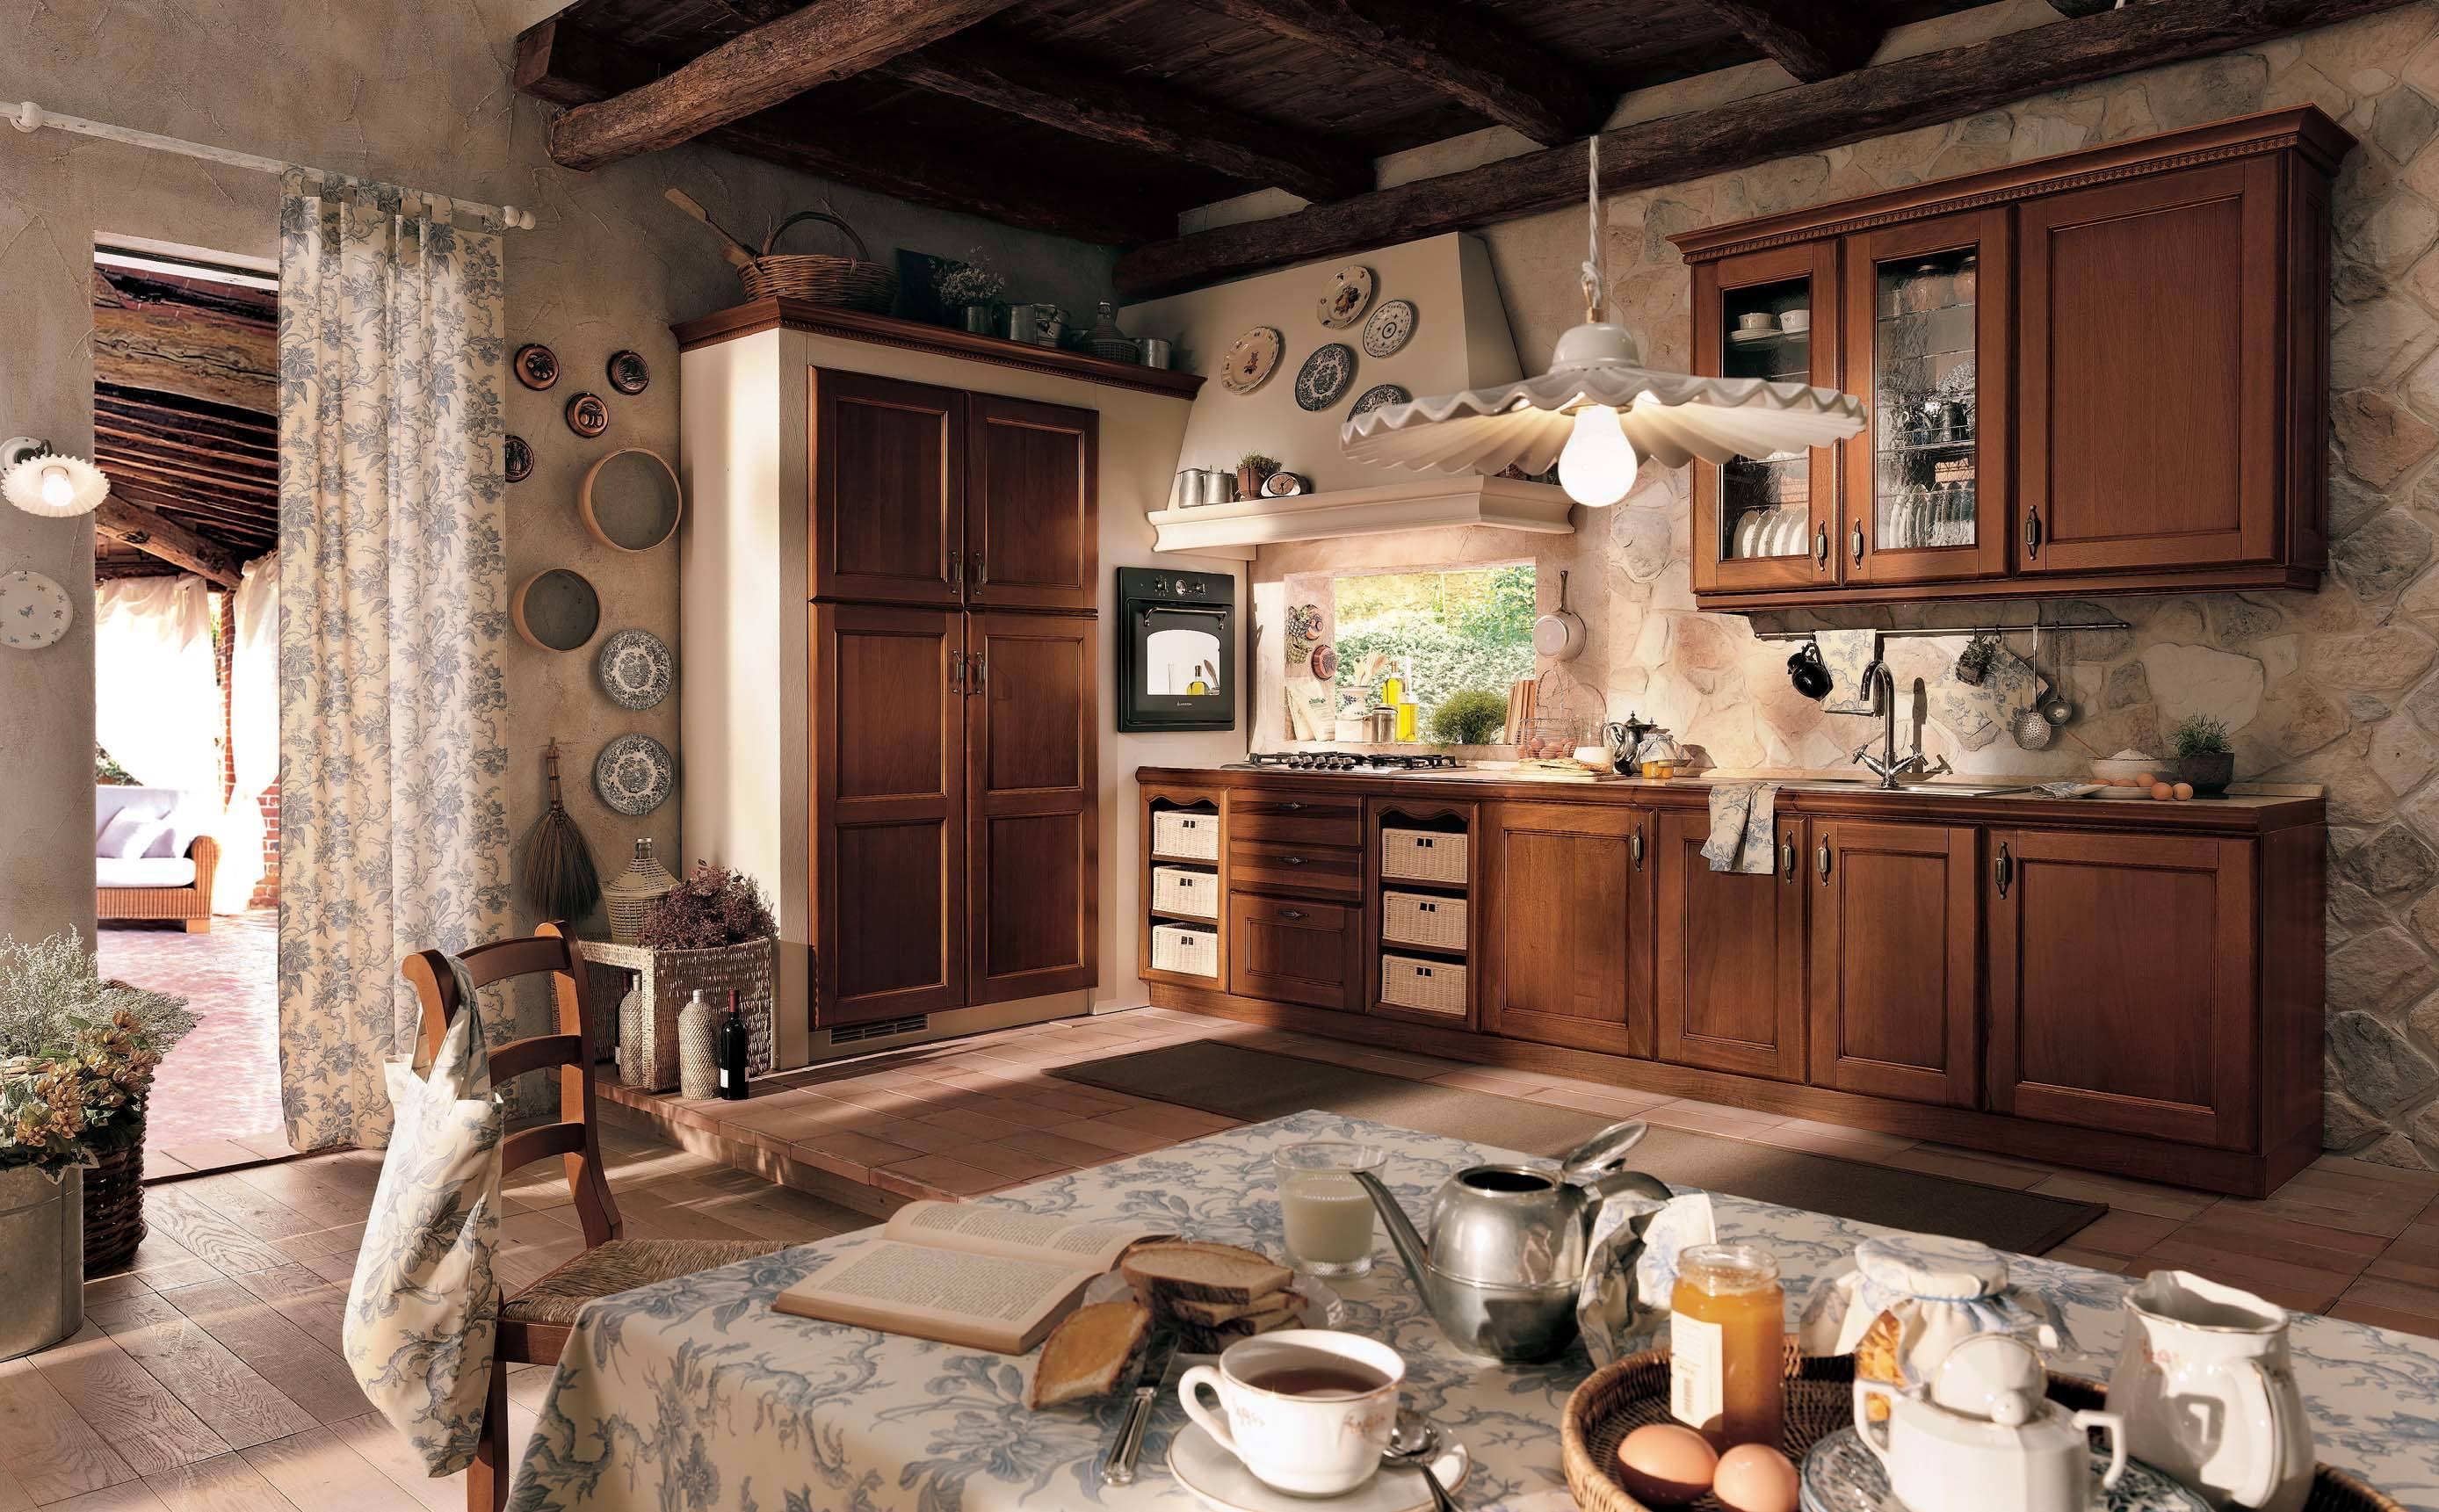 Кухня в стиле кантри фото интерьер своими руками фото 5